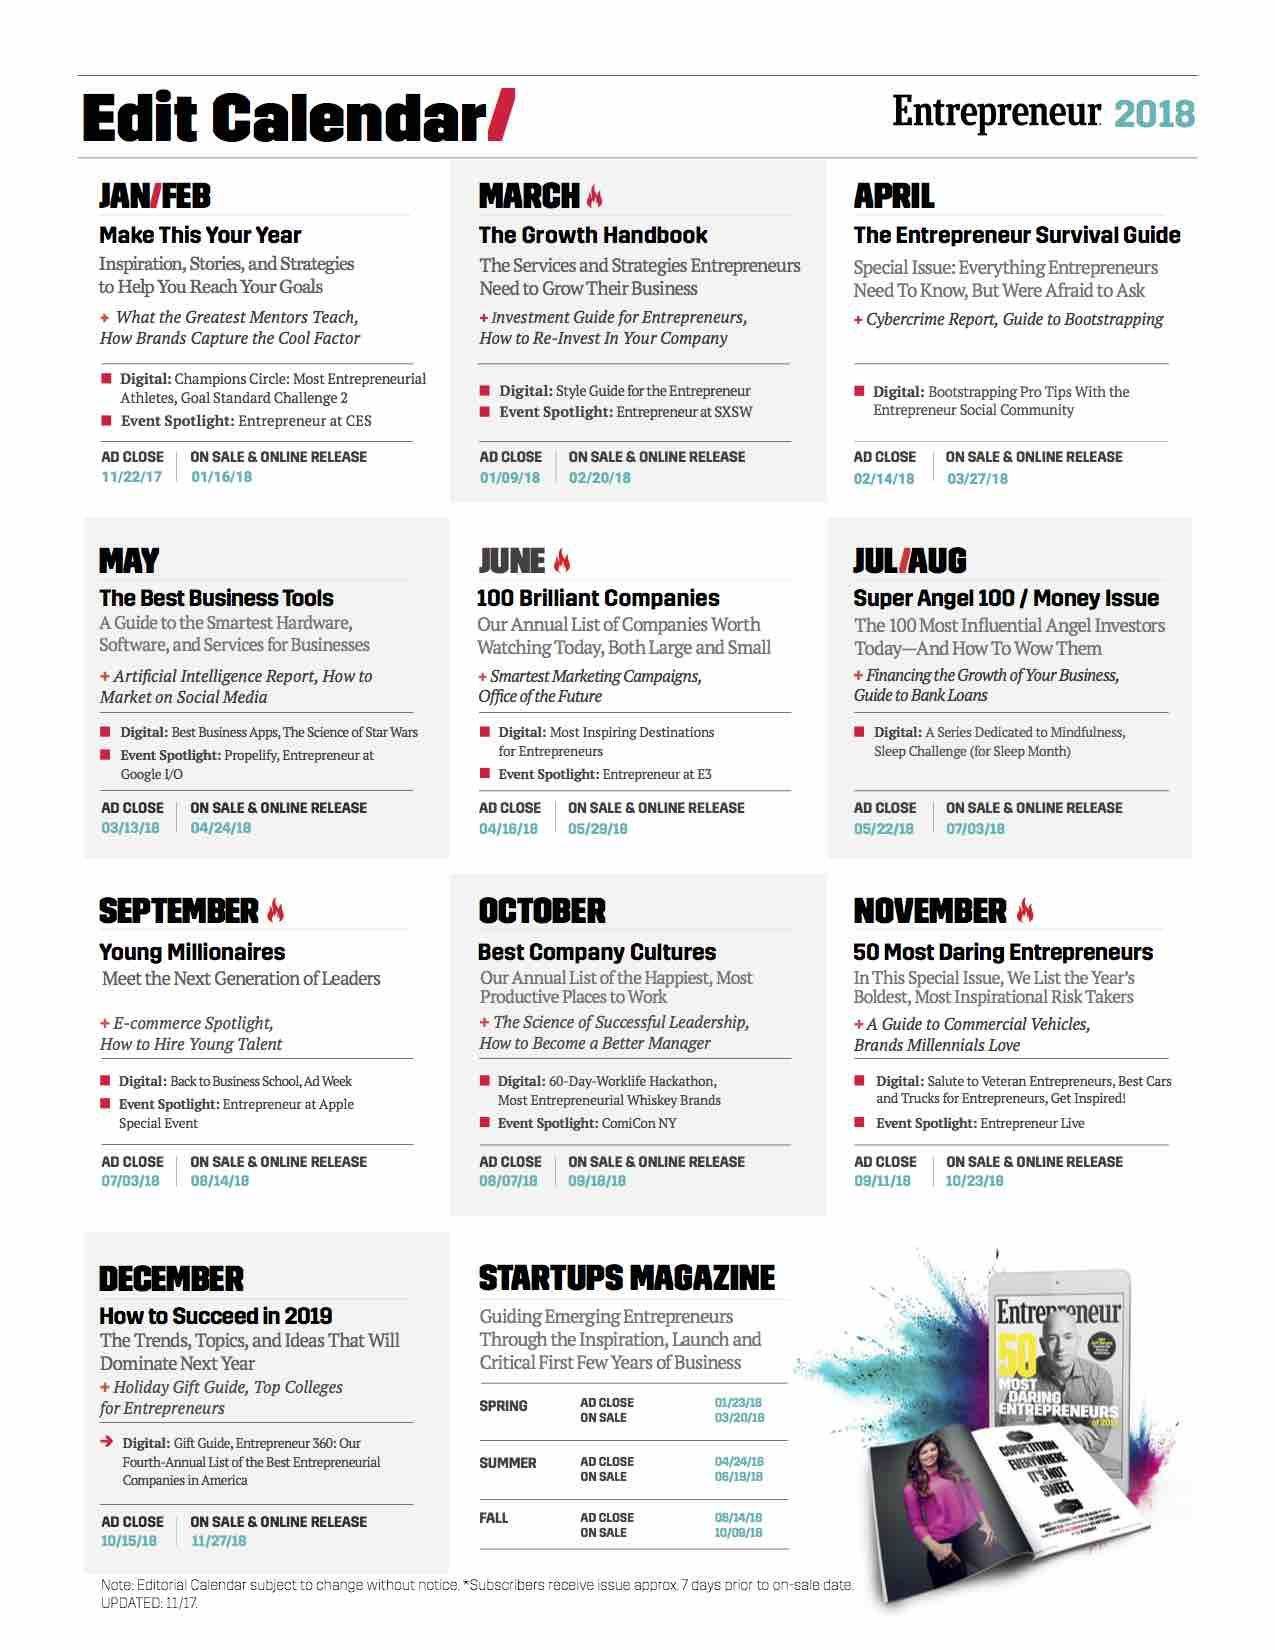 How To Create A Social Media Content Calendar Tips And Templates Social Media Content Calendar Social Media Calendar Template Social Media Strategy Template